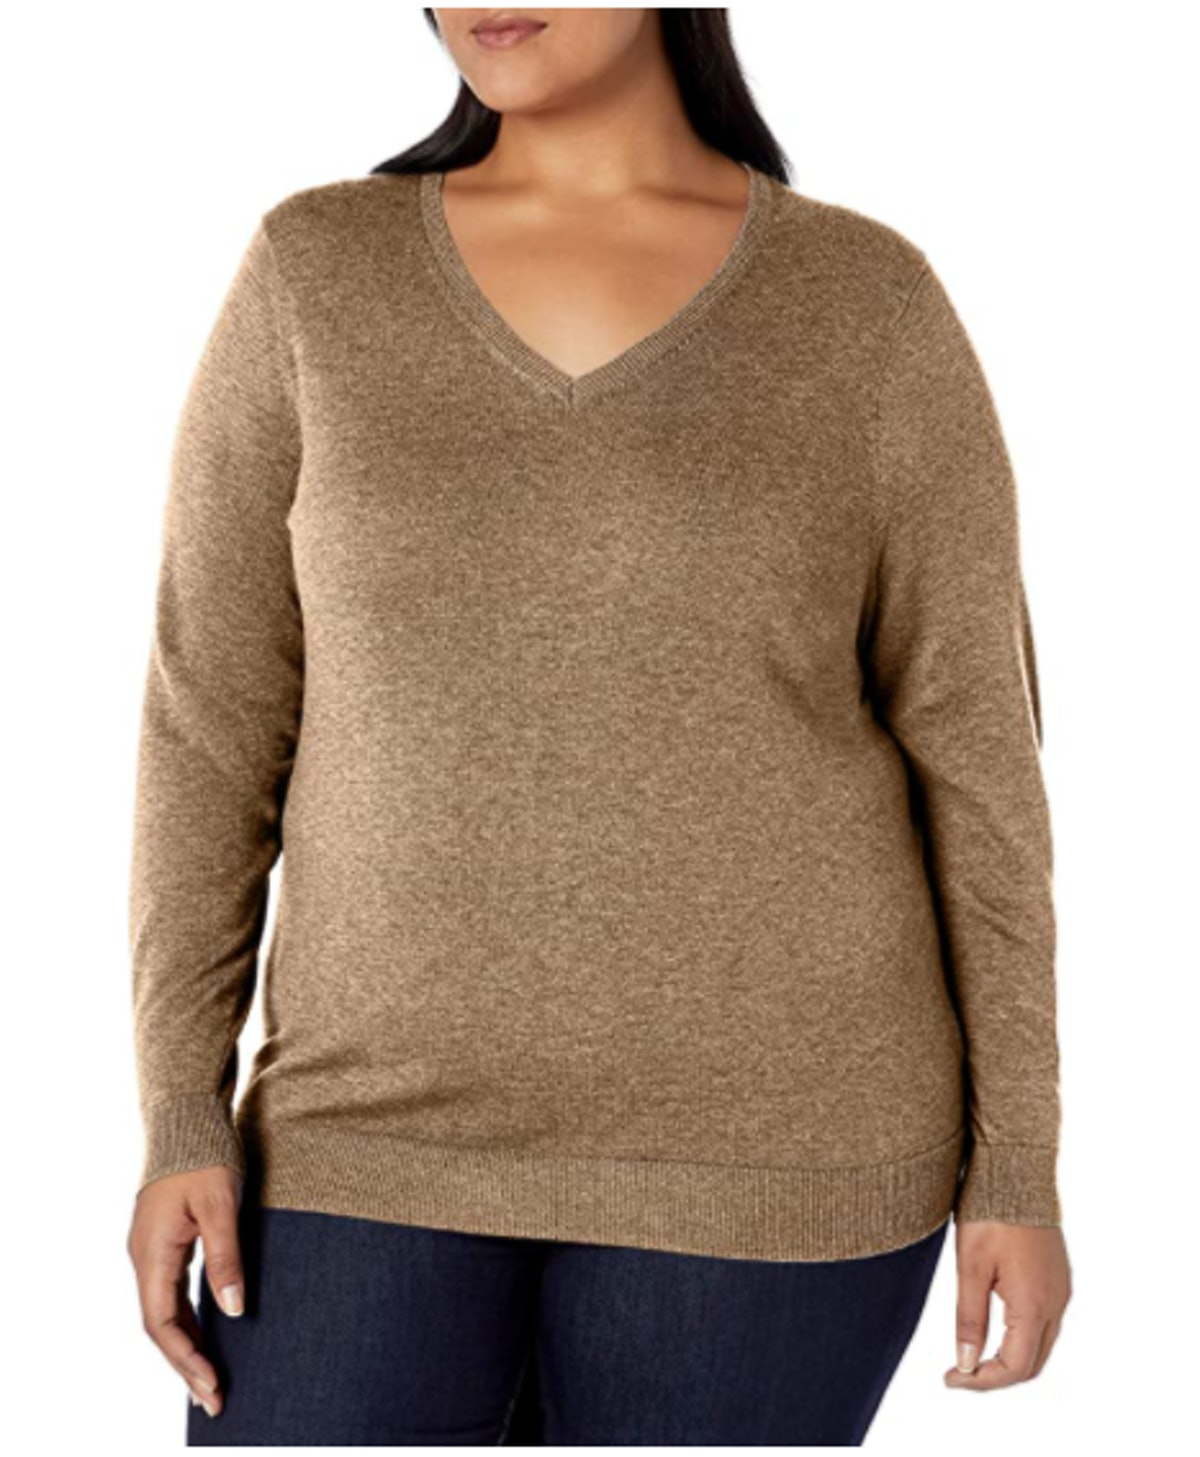 Amazon Essentials Plus Size V-Neck Sweater